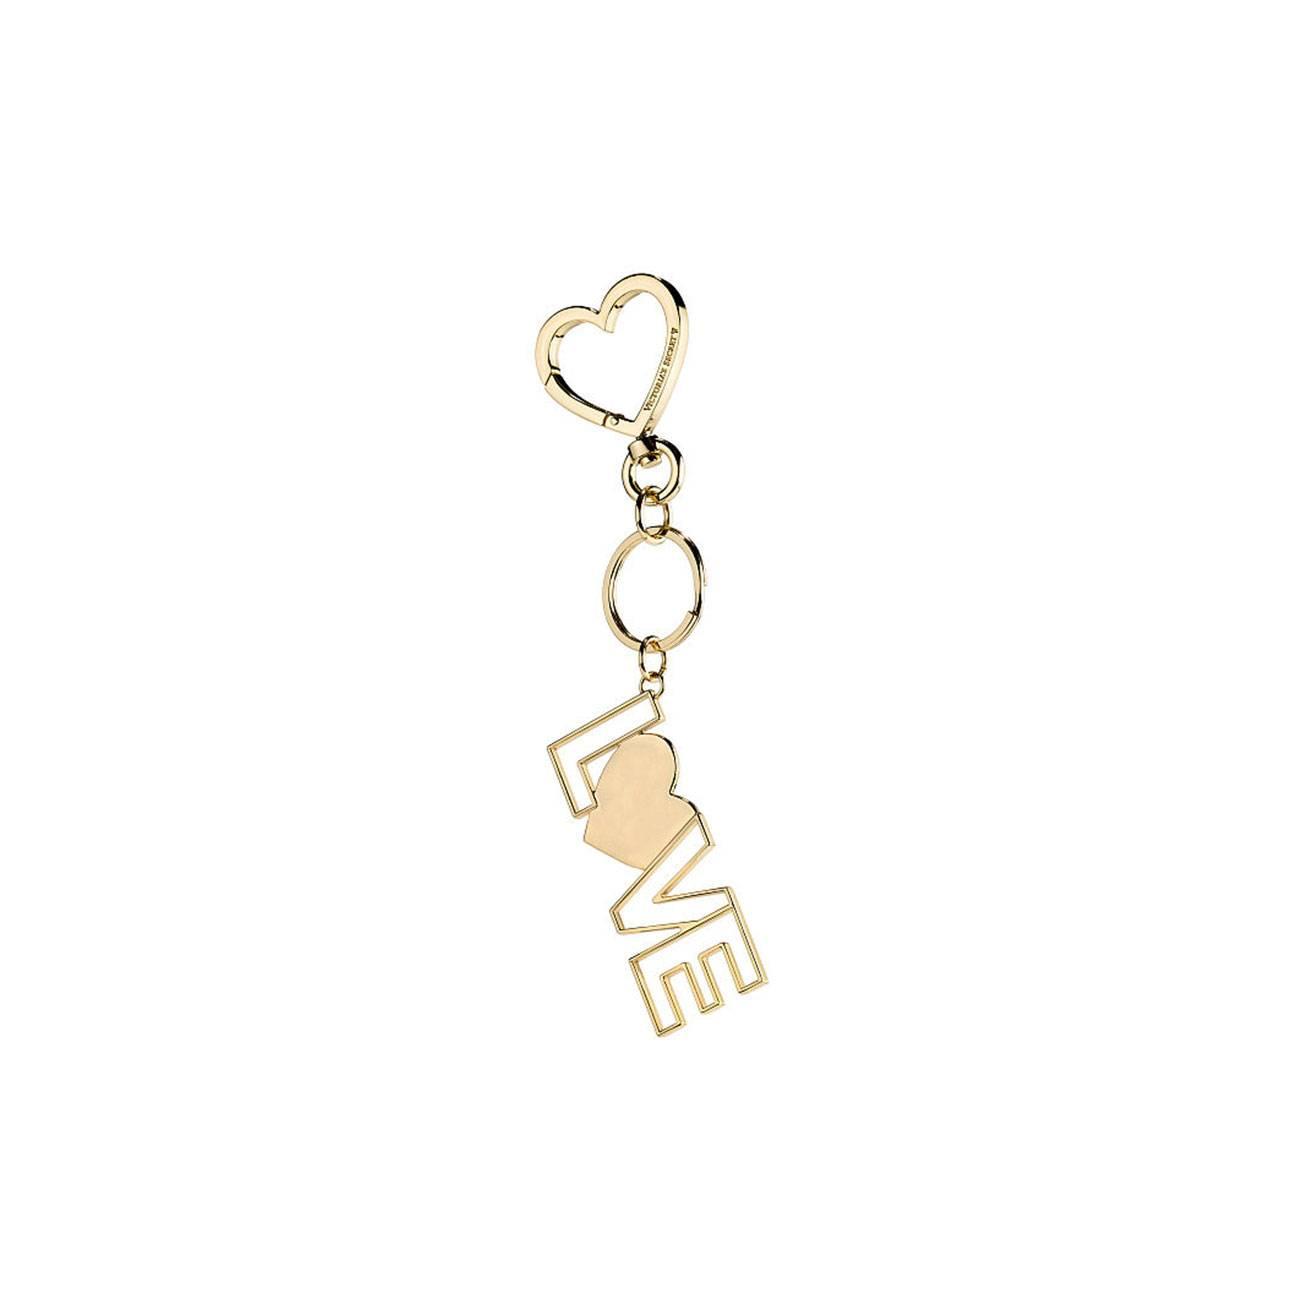 XO Love Charm Keychain imagine produs